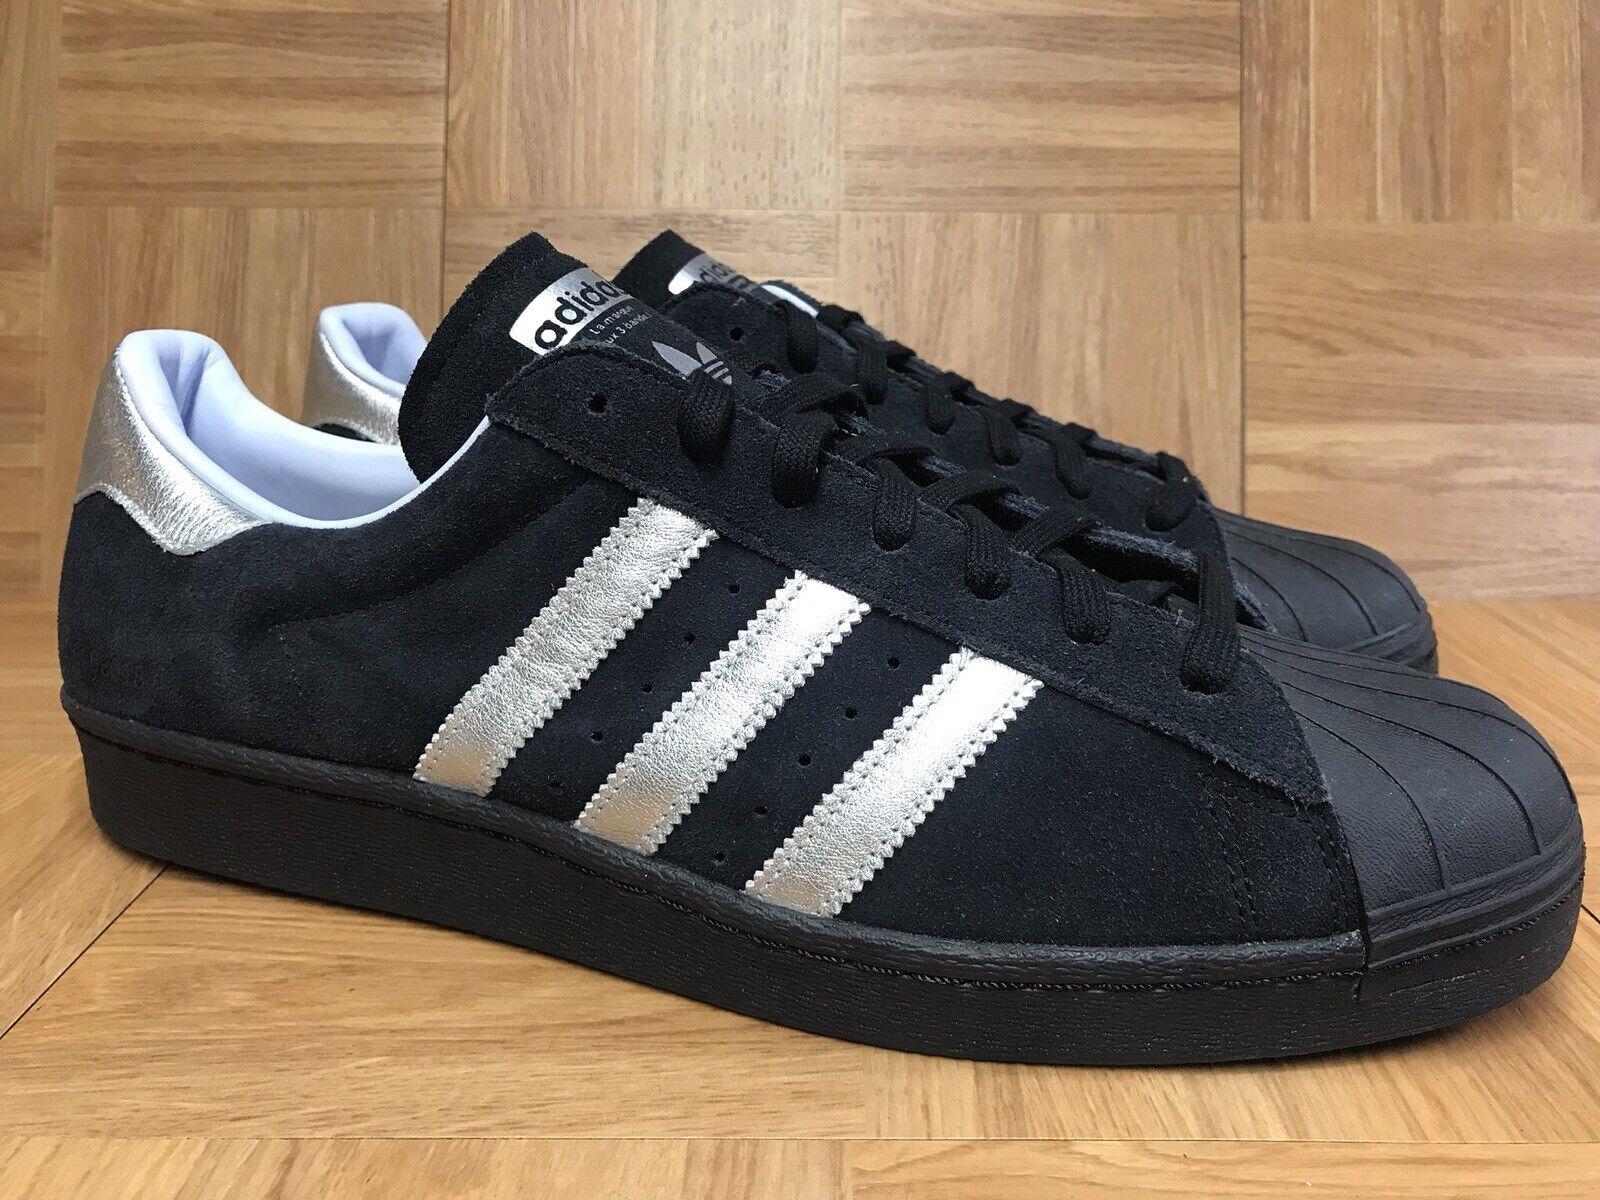 RARE Adidas Superstar shoes Black Silver gold Suede Sz 13 B94463 Mi-Adidas